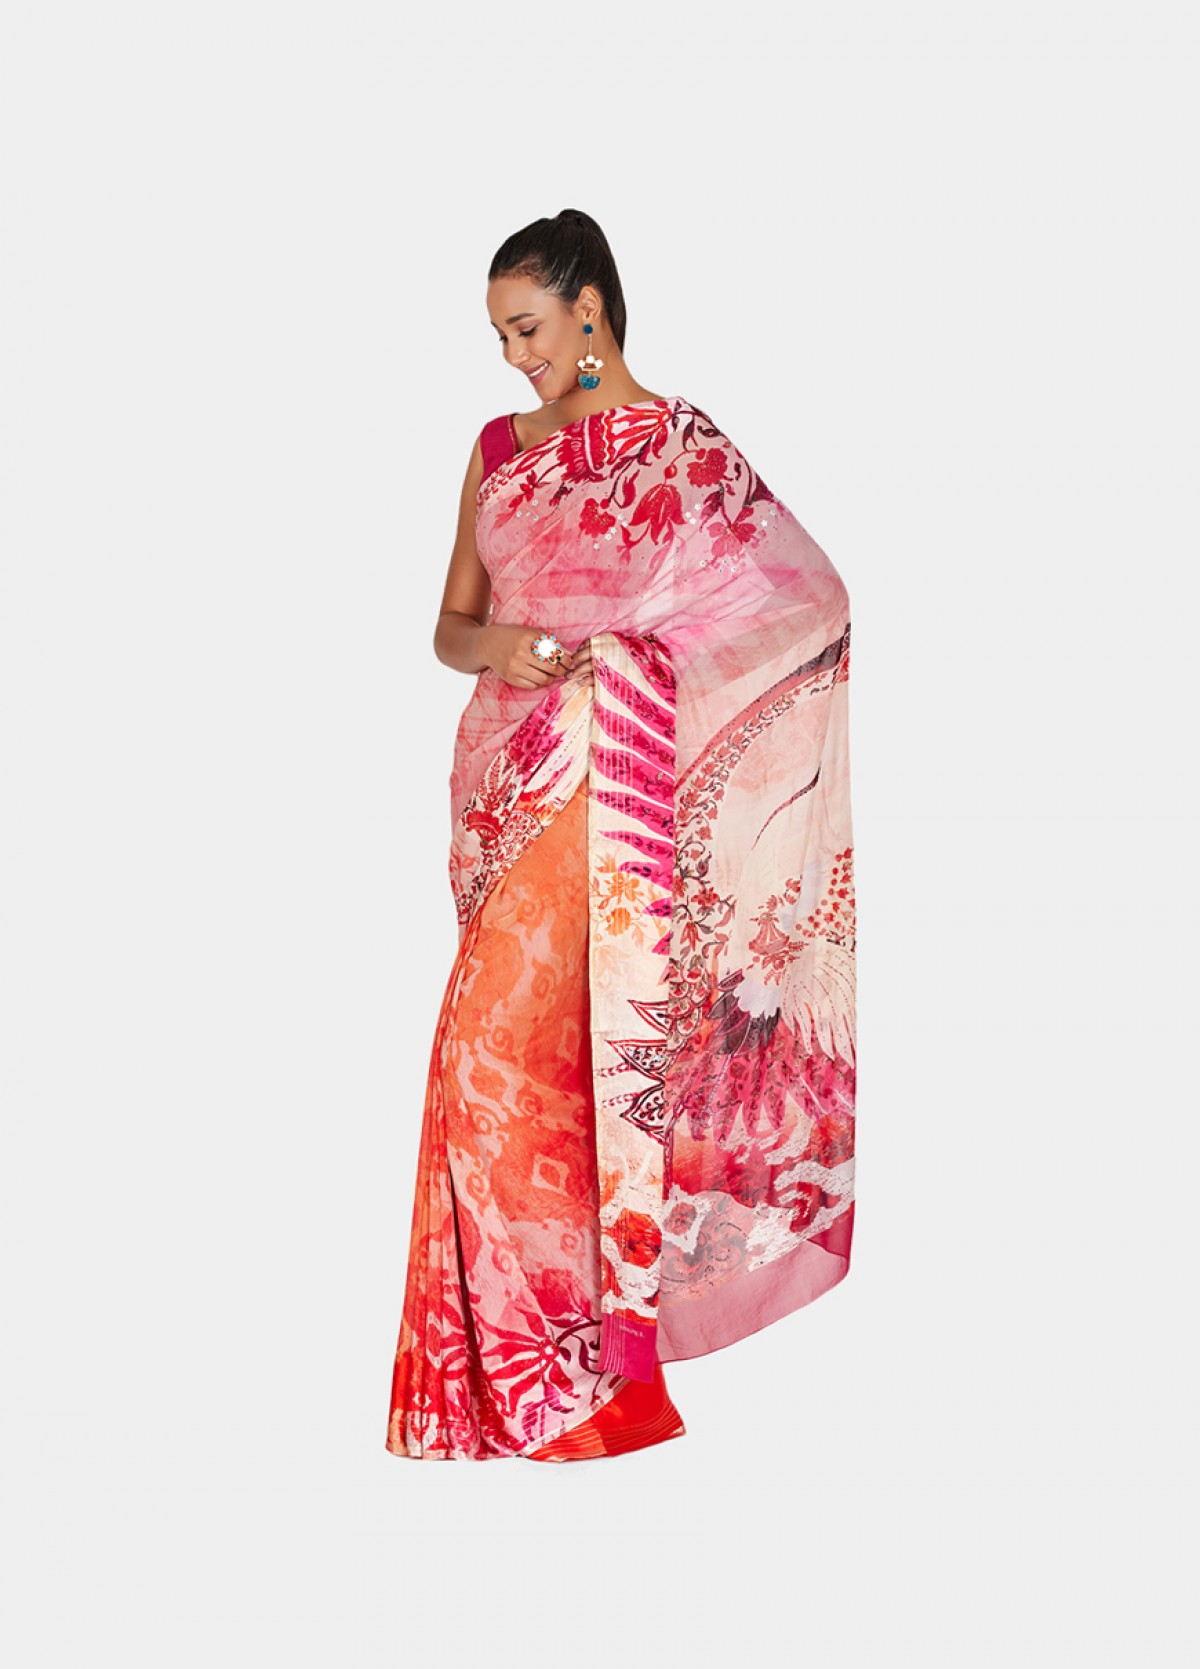 The Crane Sari